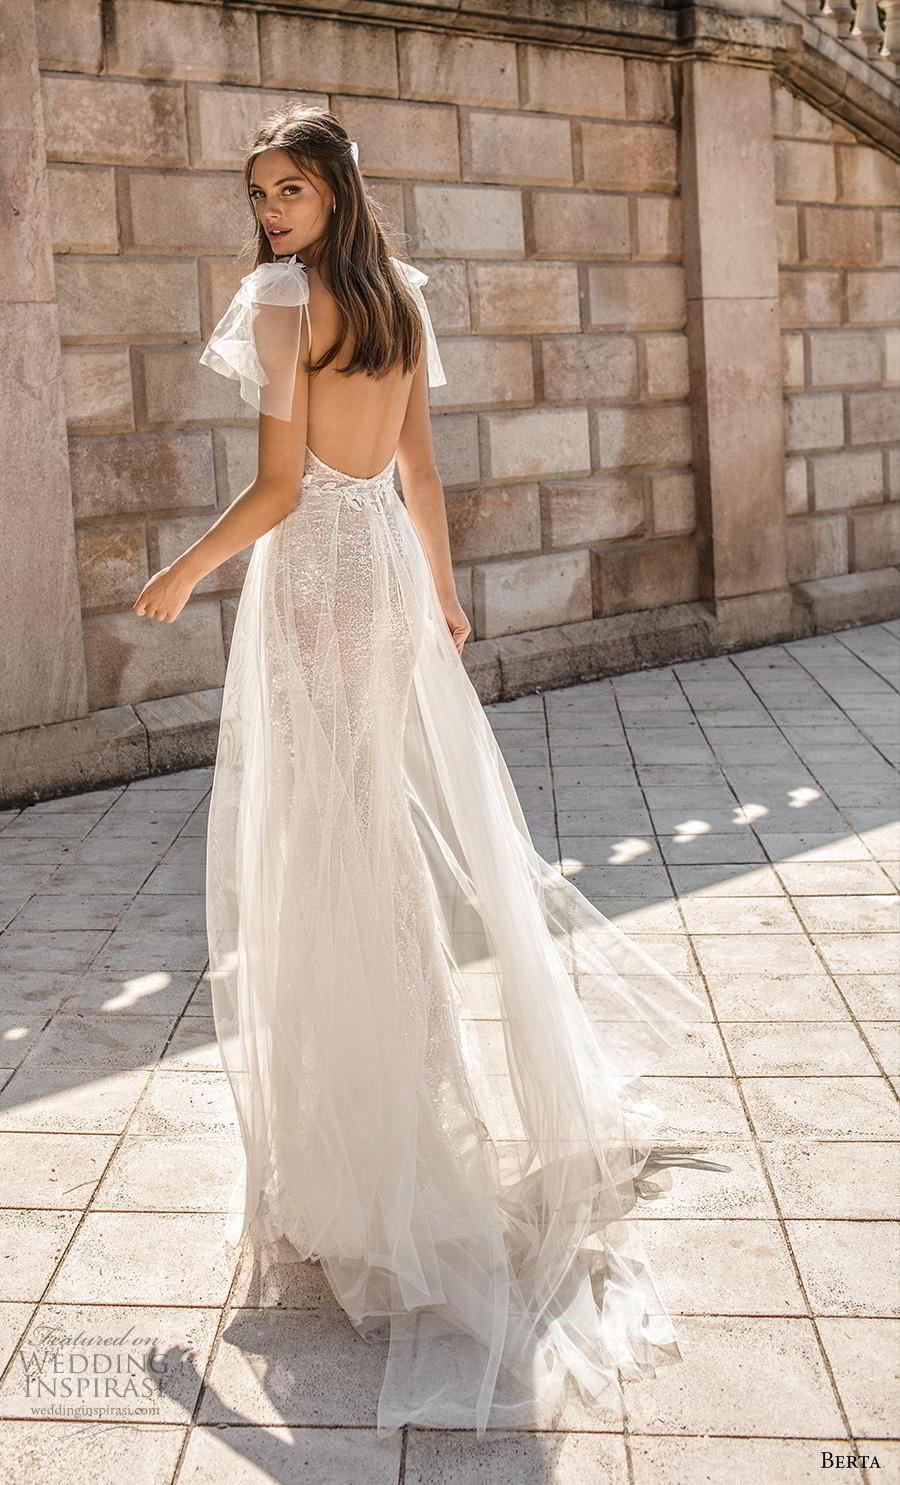 berta fall 2019 muse bridal cap sleeves deep v neck full embellishment slit skirt glitzy glamorous elegant sheath wedding dress backless sweep train (6) bv